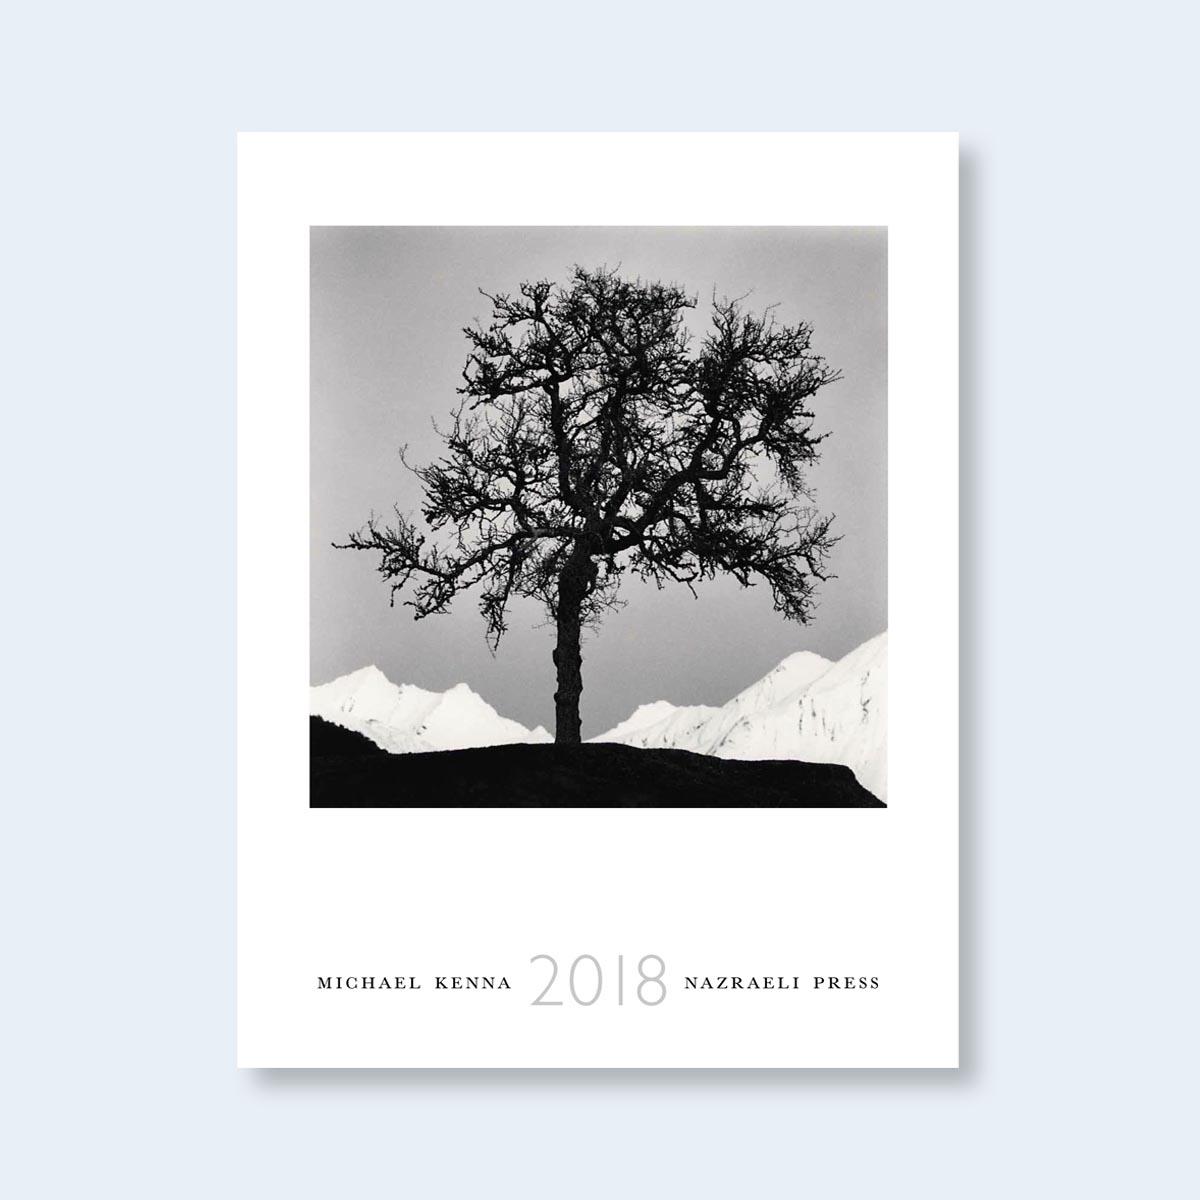 MICHAEL KENNA |   2    018 Wall Calendar   |  Order >